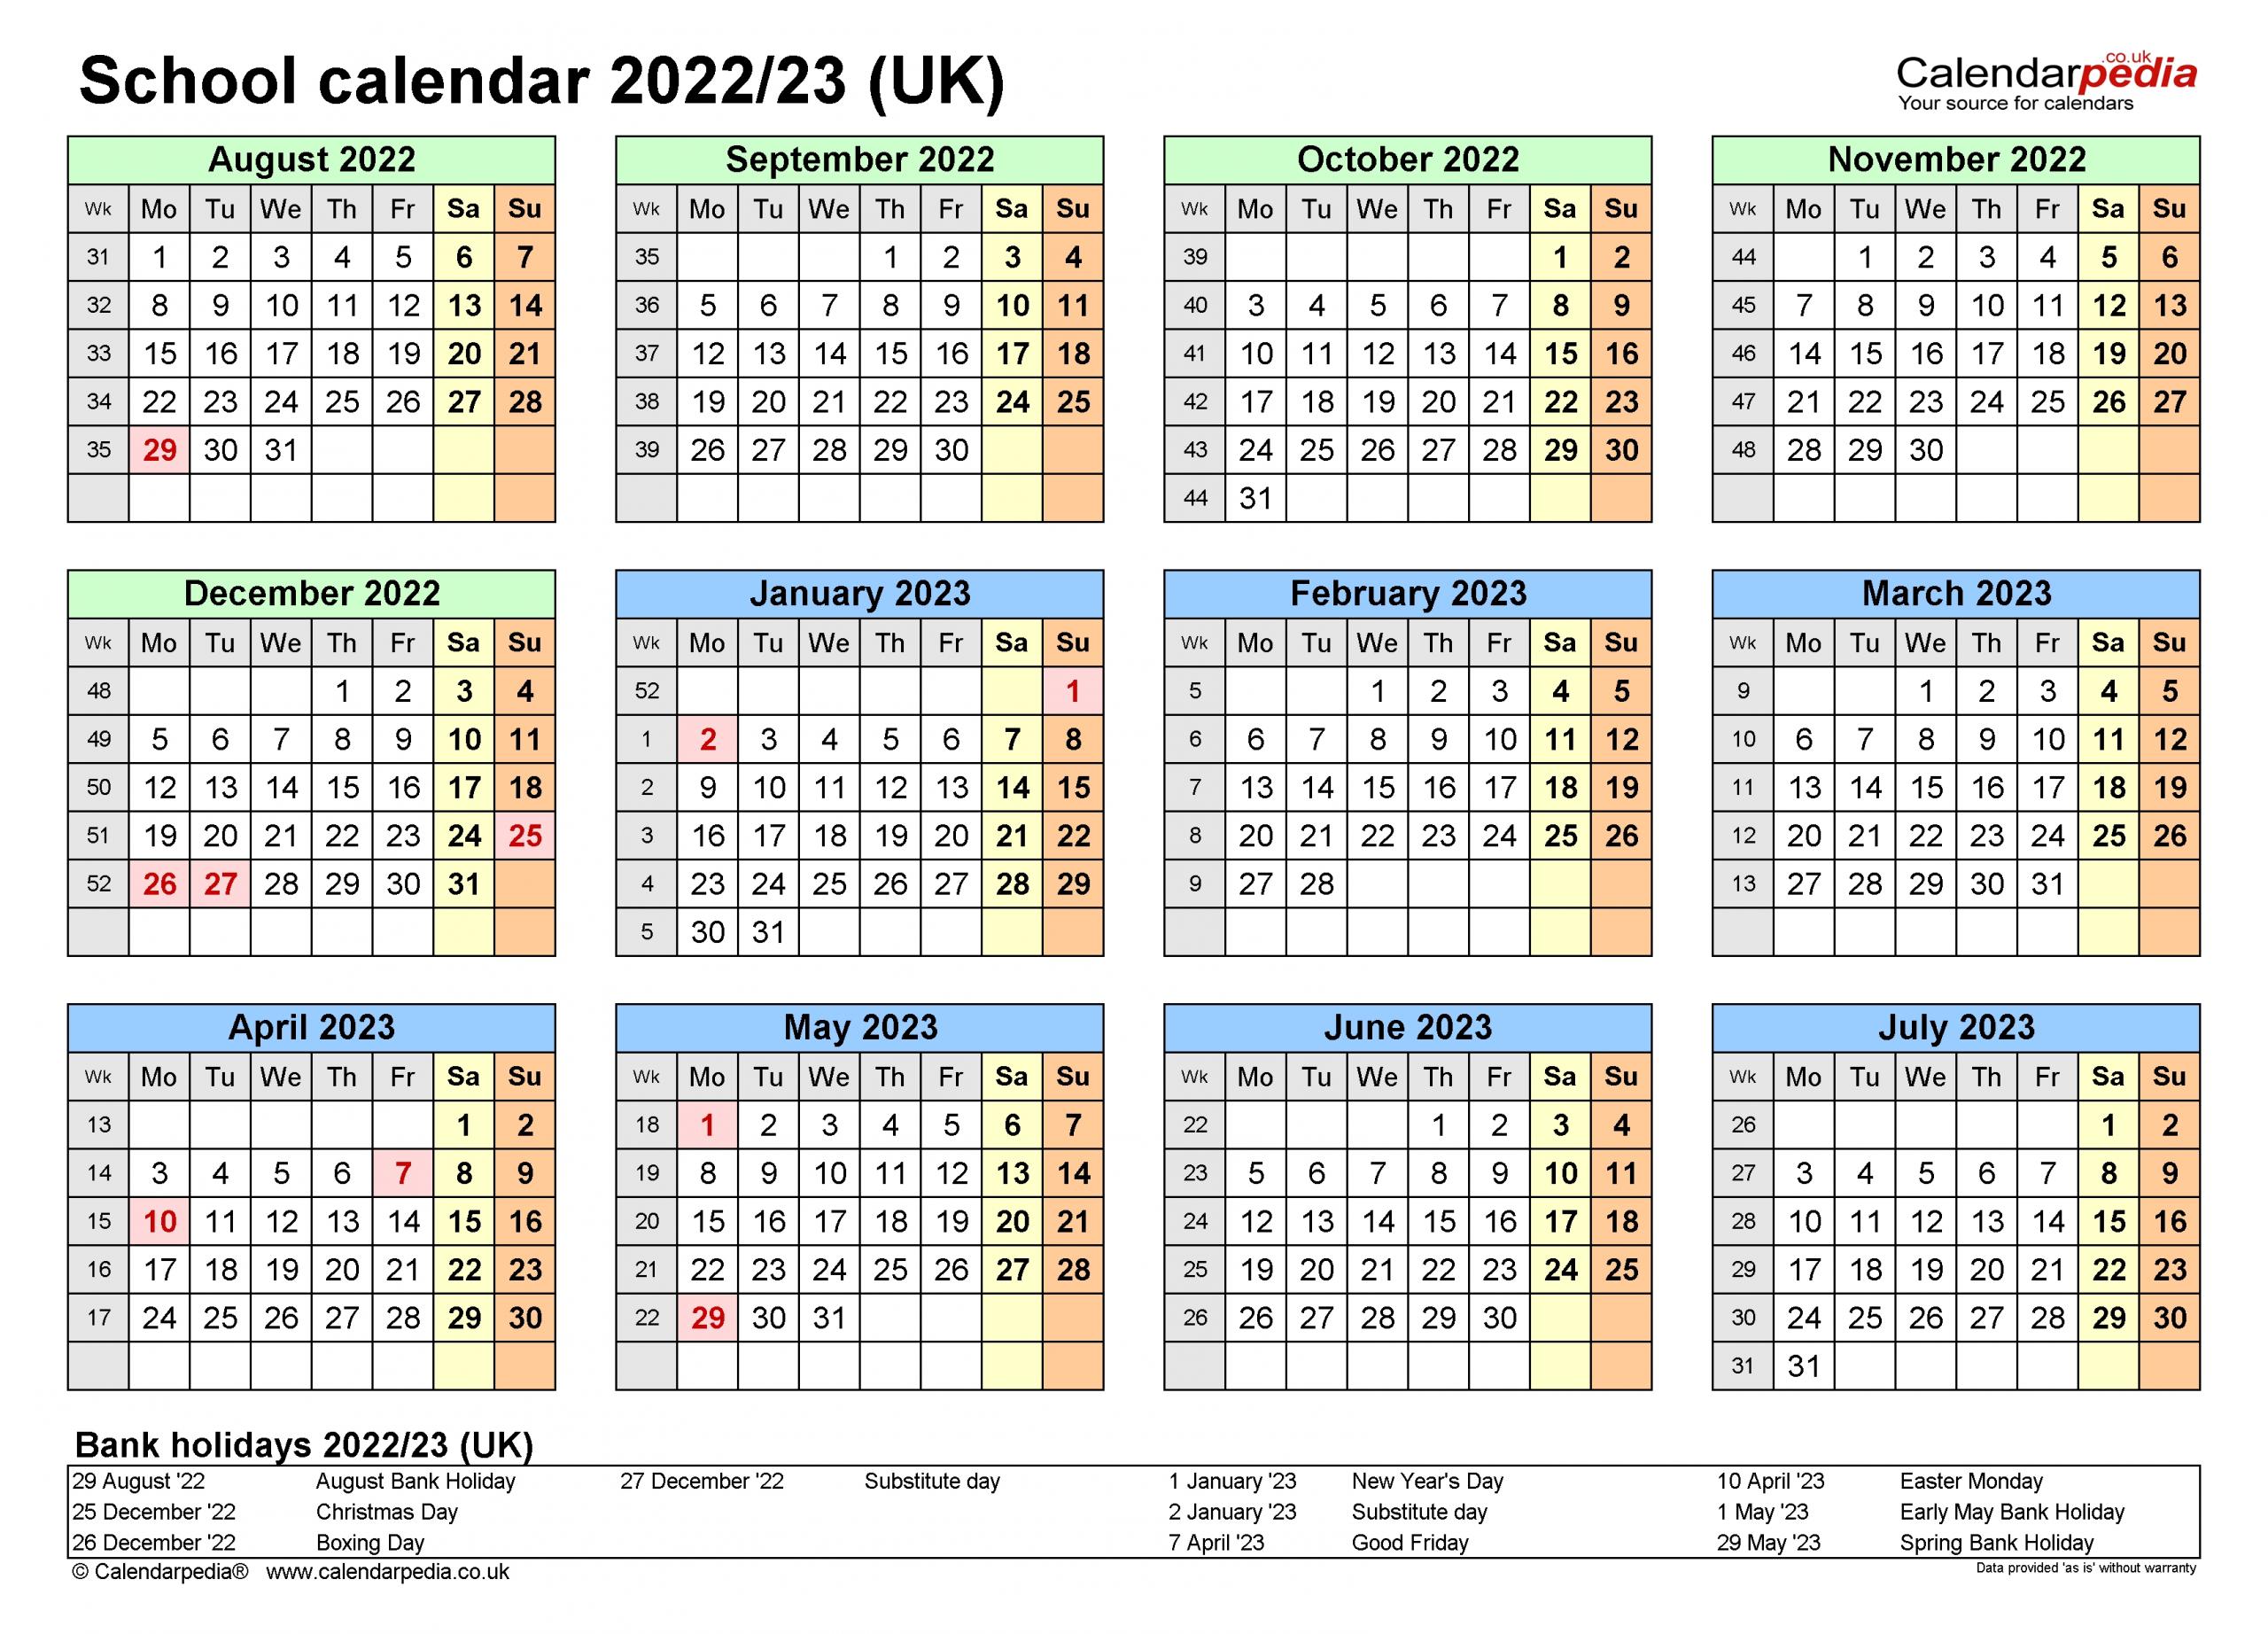 School Calendars 2022/23 Uk - Free Printable Word Templates